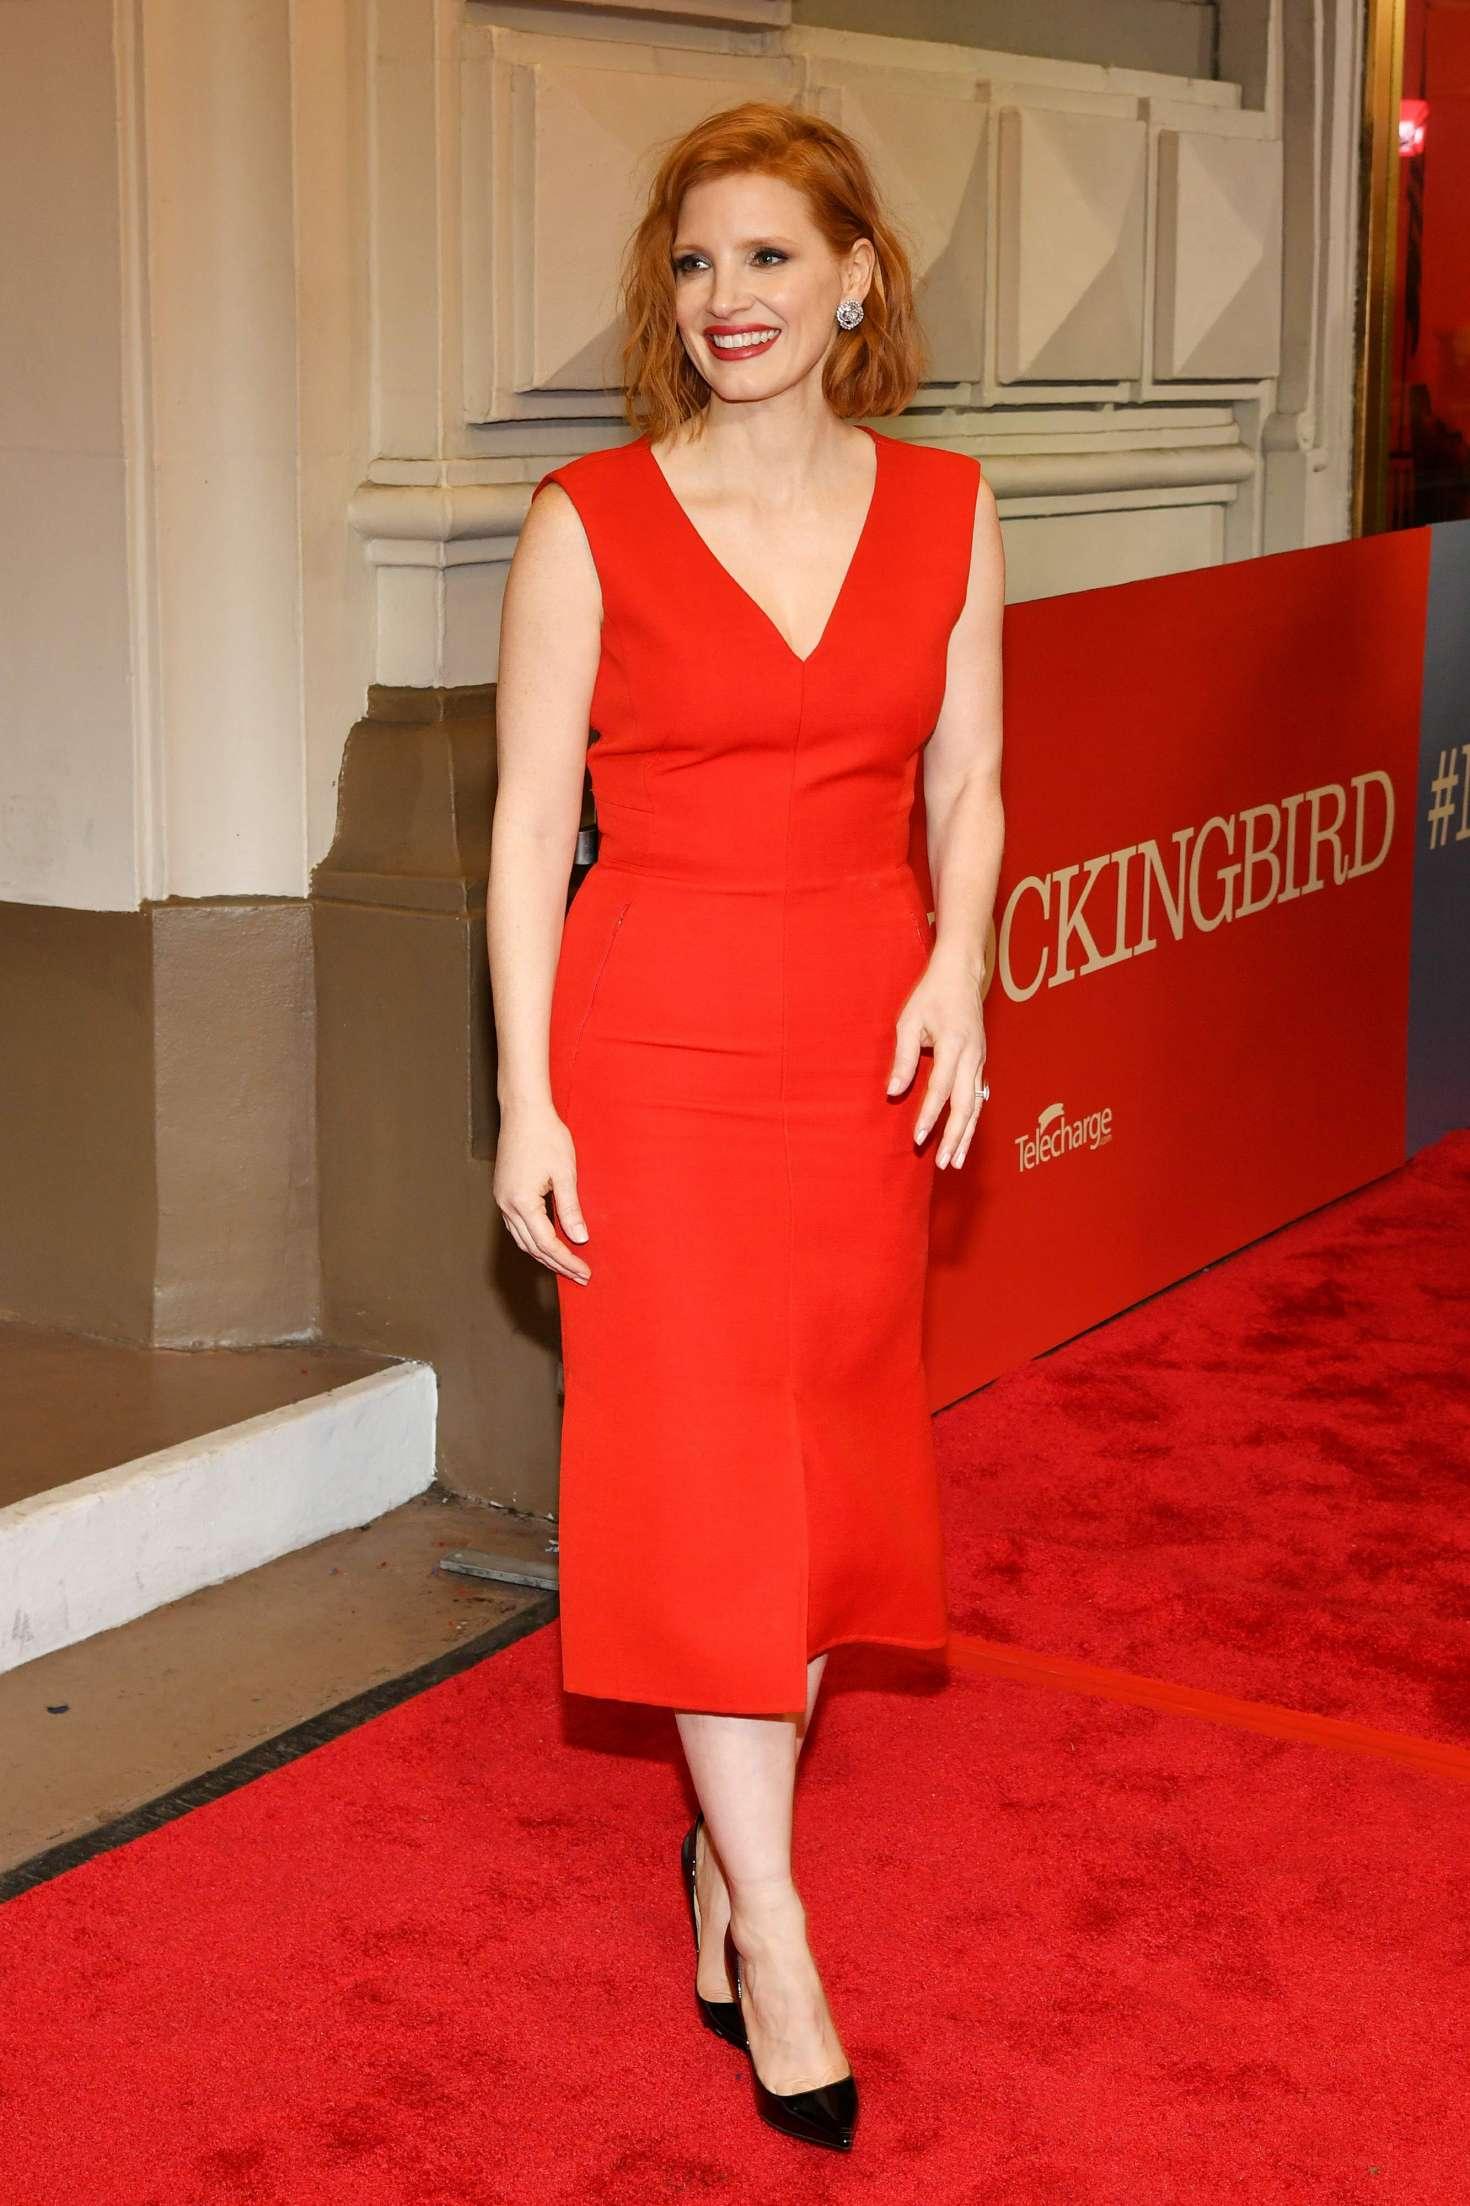 Jessica Chastain 2018 : Jessica Chastain: To Kill A Mockingbird Opening Night -05